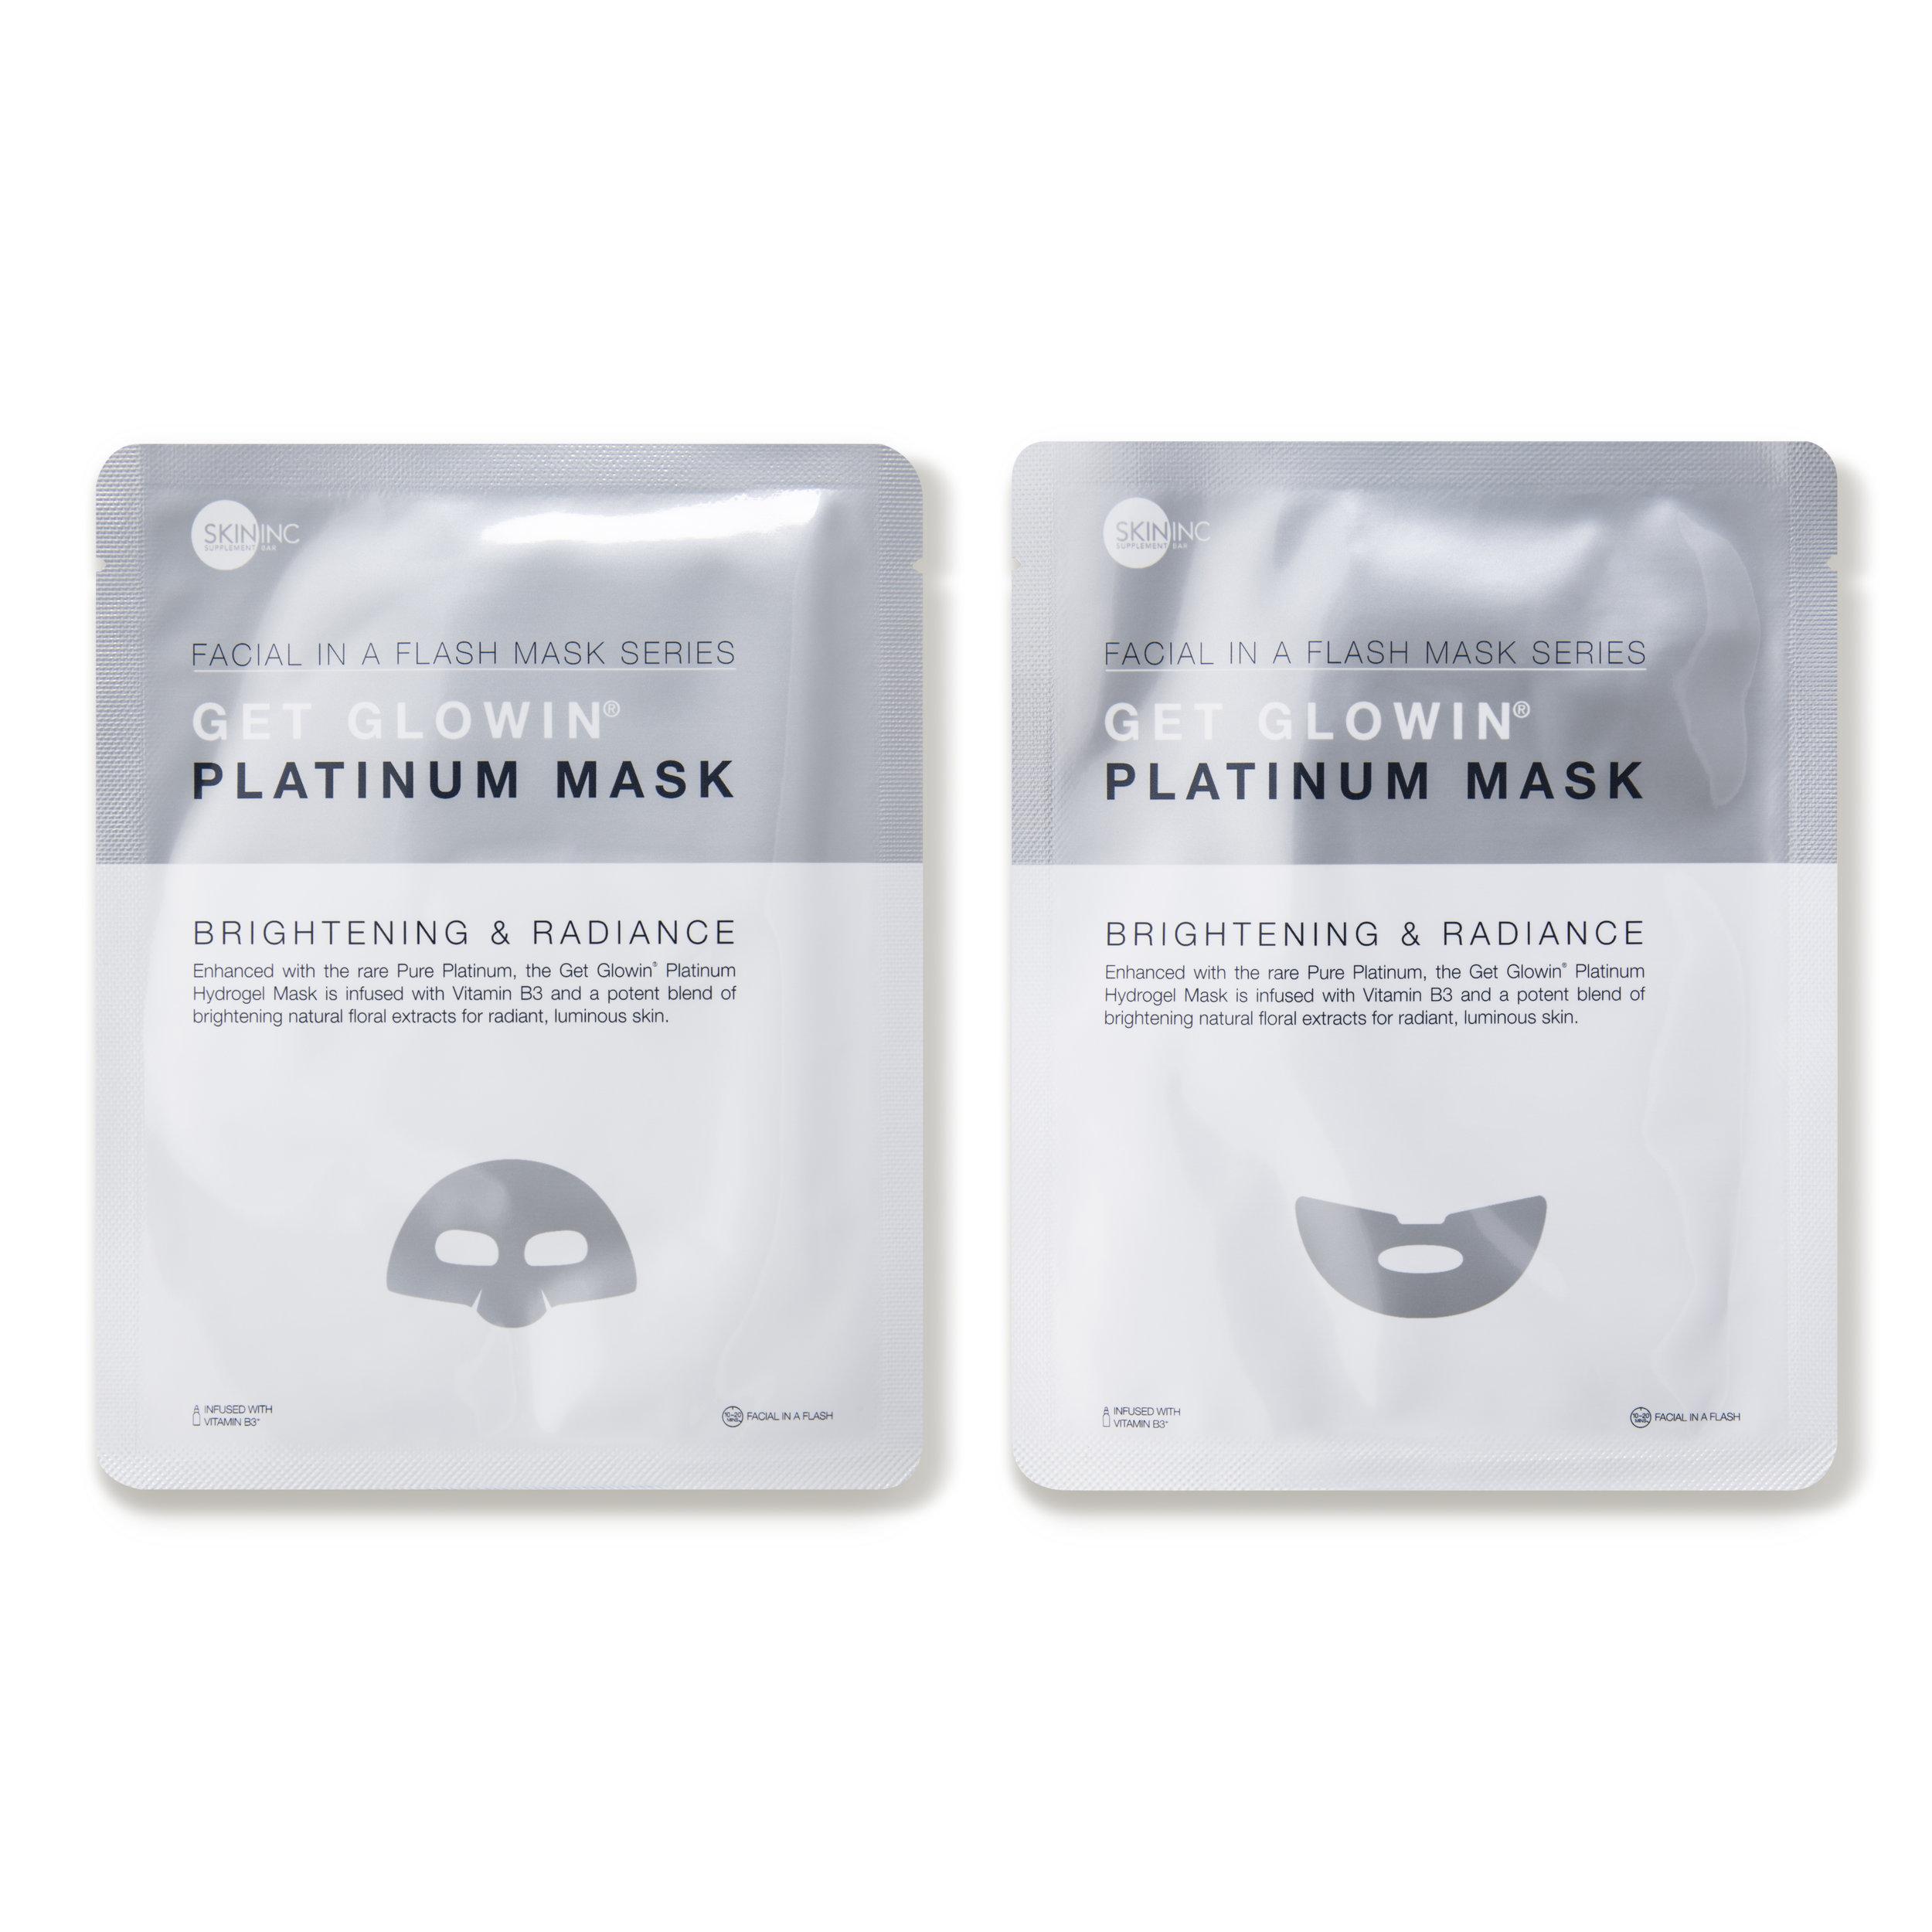 8. SKIN INC Supplement Bar Get Glowin Platinum Gold Mask (3 count) $33.00 from www.dermstore.com